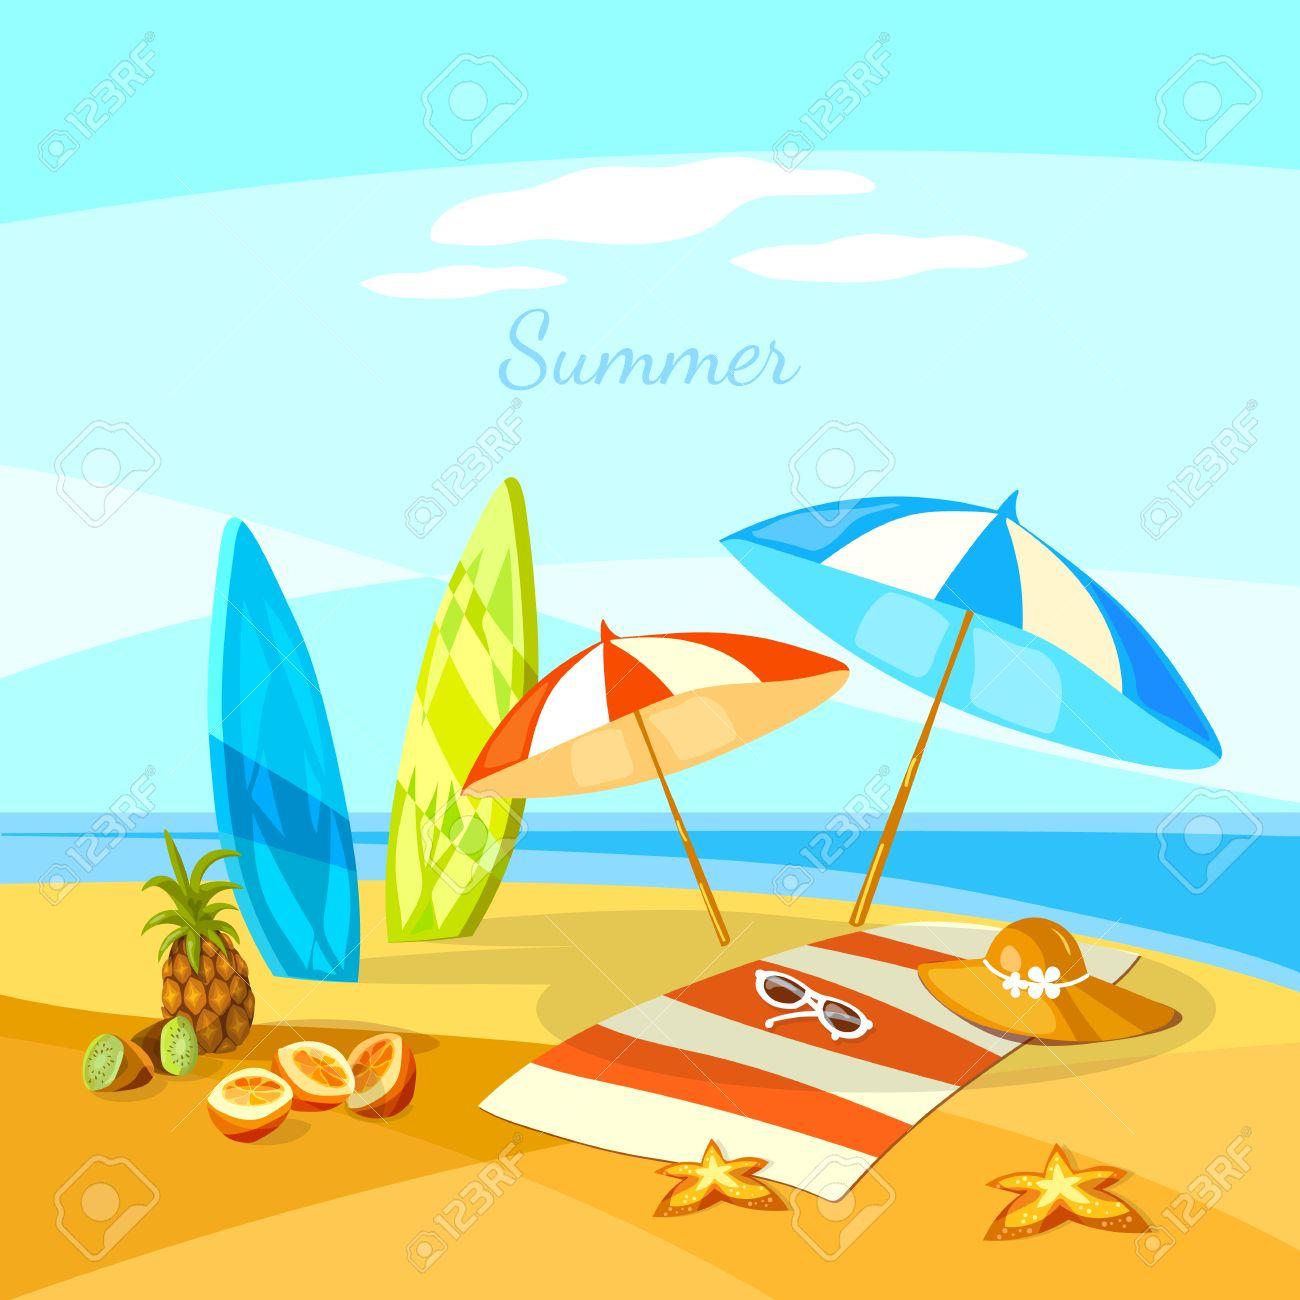 BROADMEAD'S SUMMER BEACH BONANZA